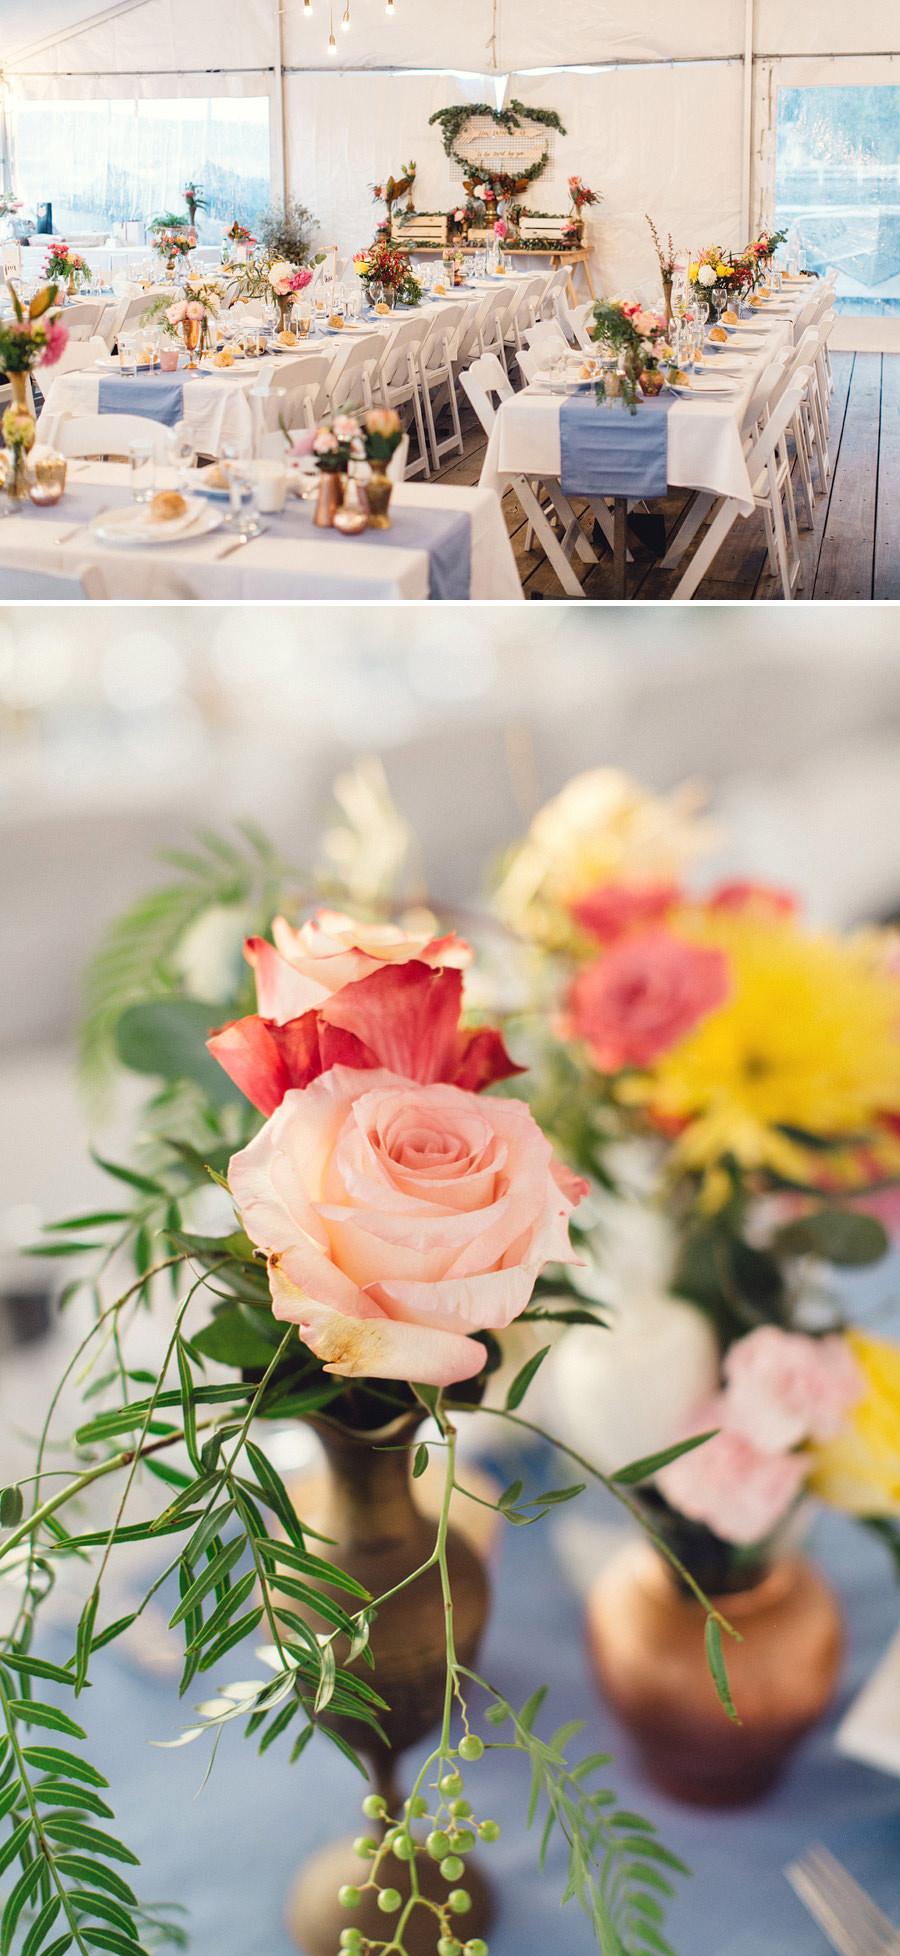 Avalon Sailing Club Wedding Photographers: Reception details